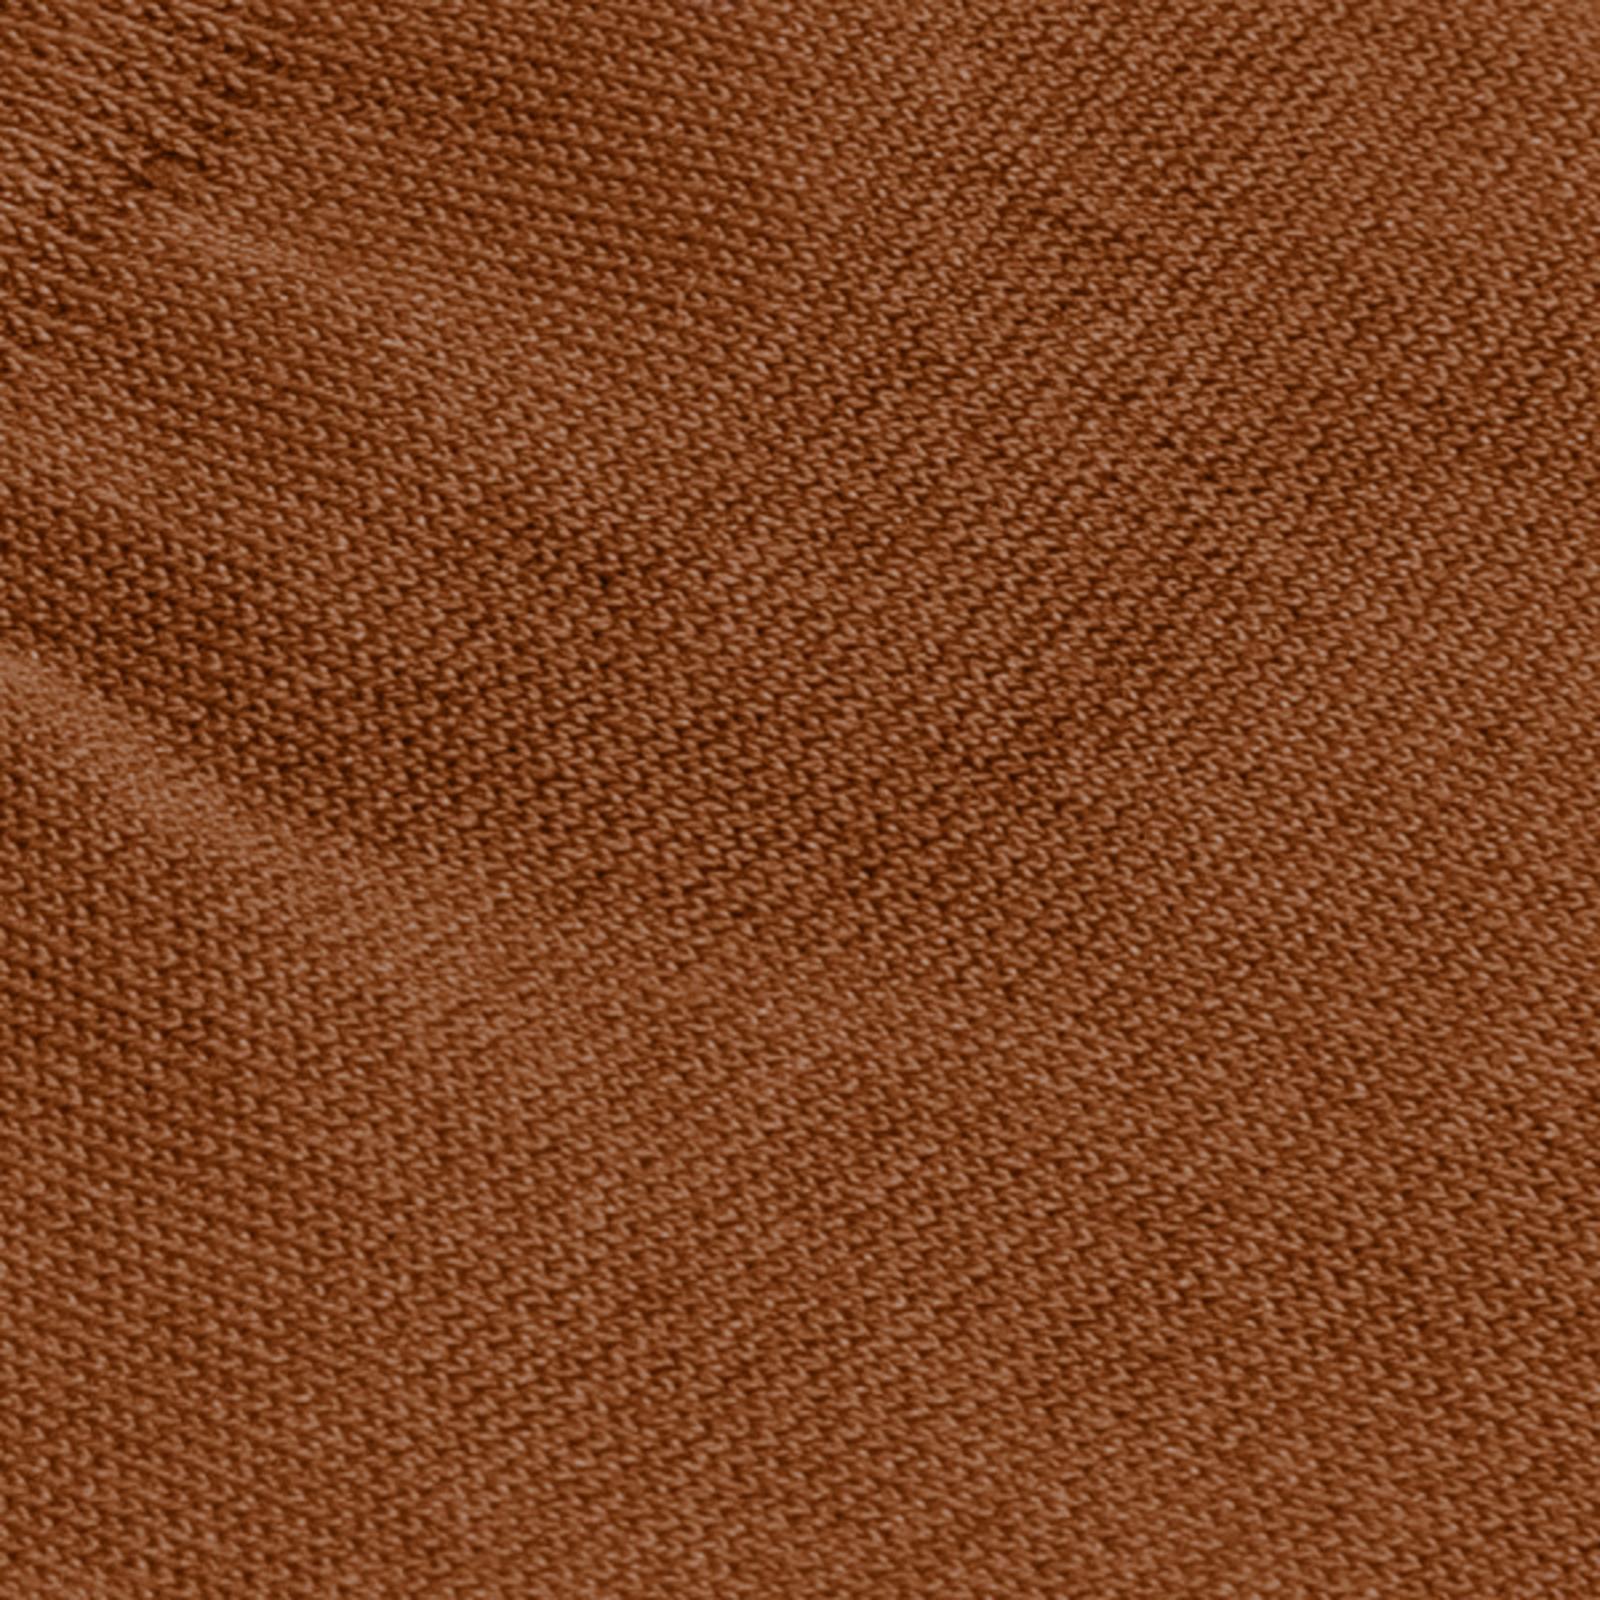 Carlo Lanza Cognac/camel katoenen sokken   Carlo Lanza